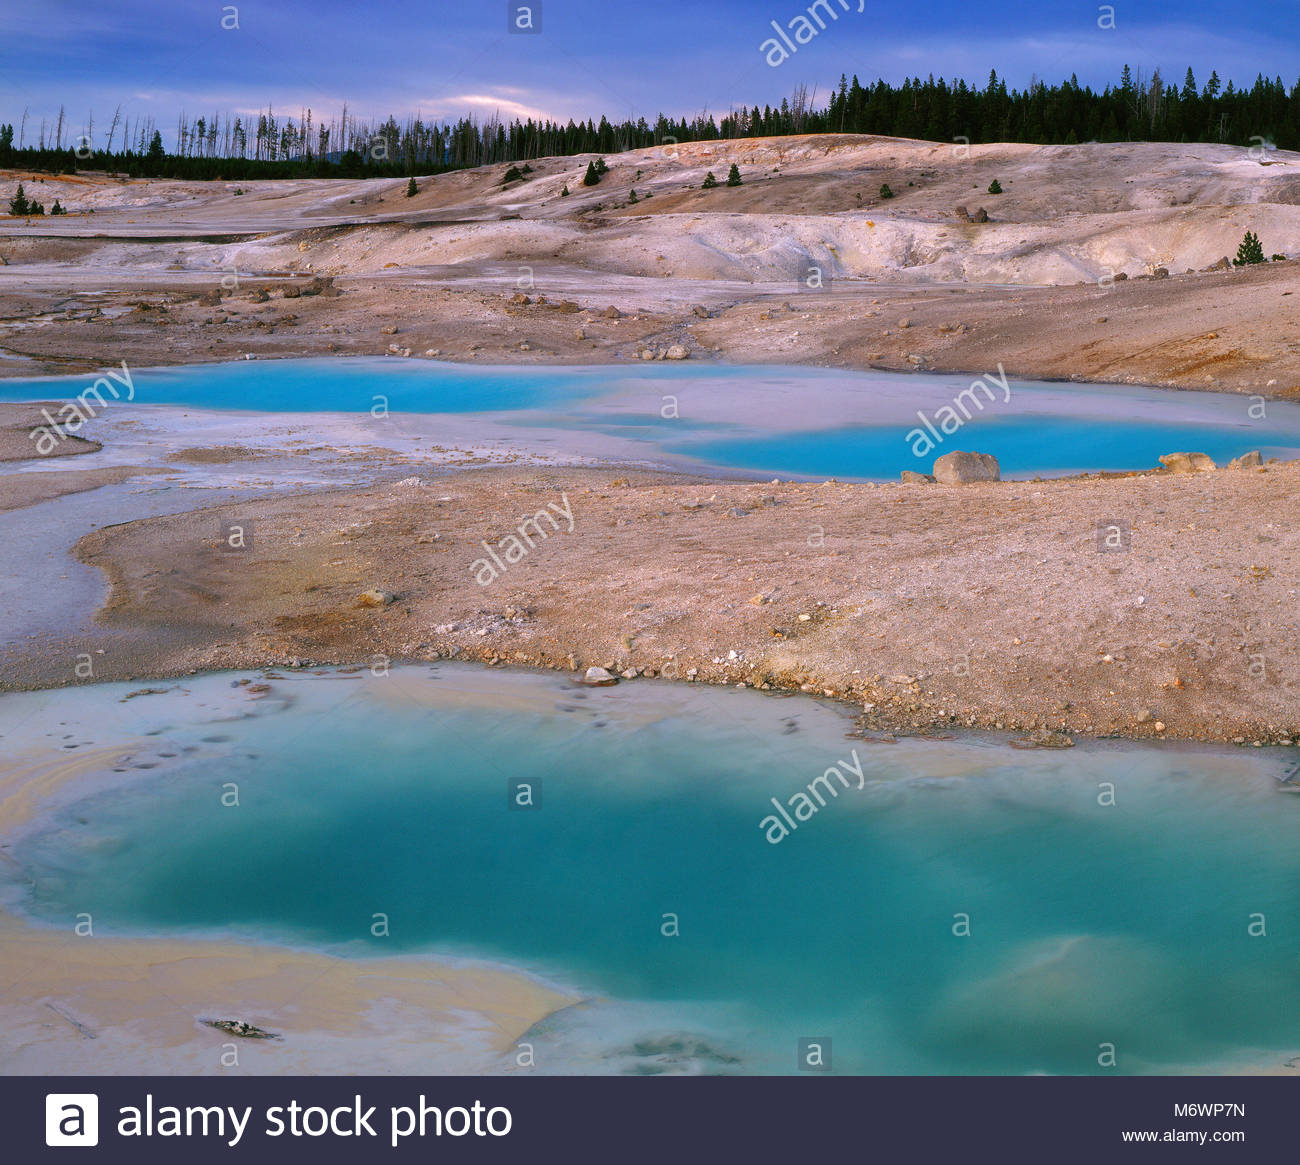 Norris Geyser Basin, Yellowstone National Park, Wyoming - Stock Image